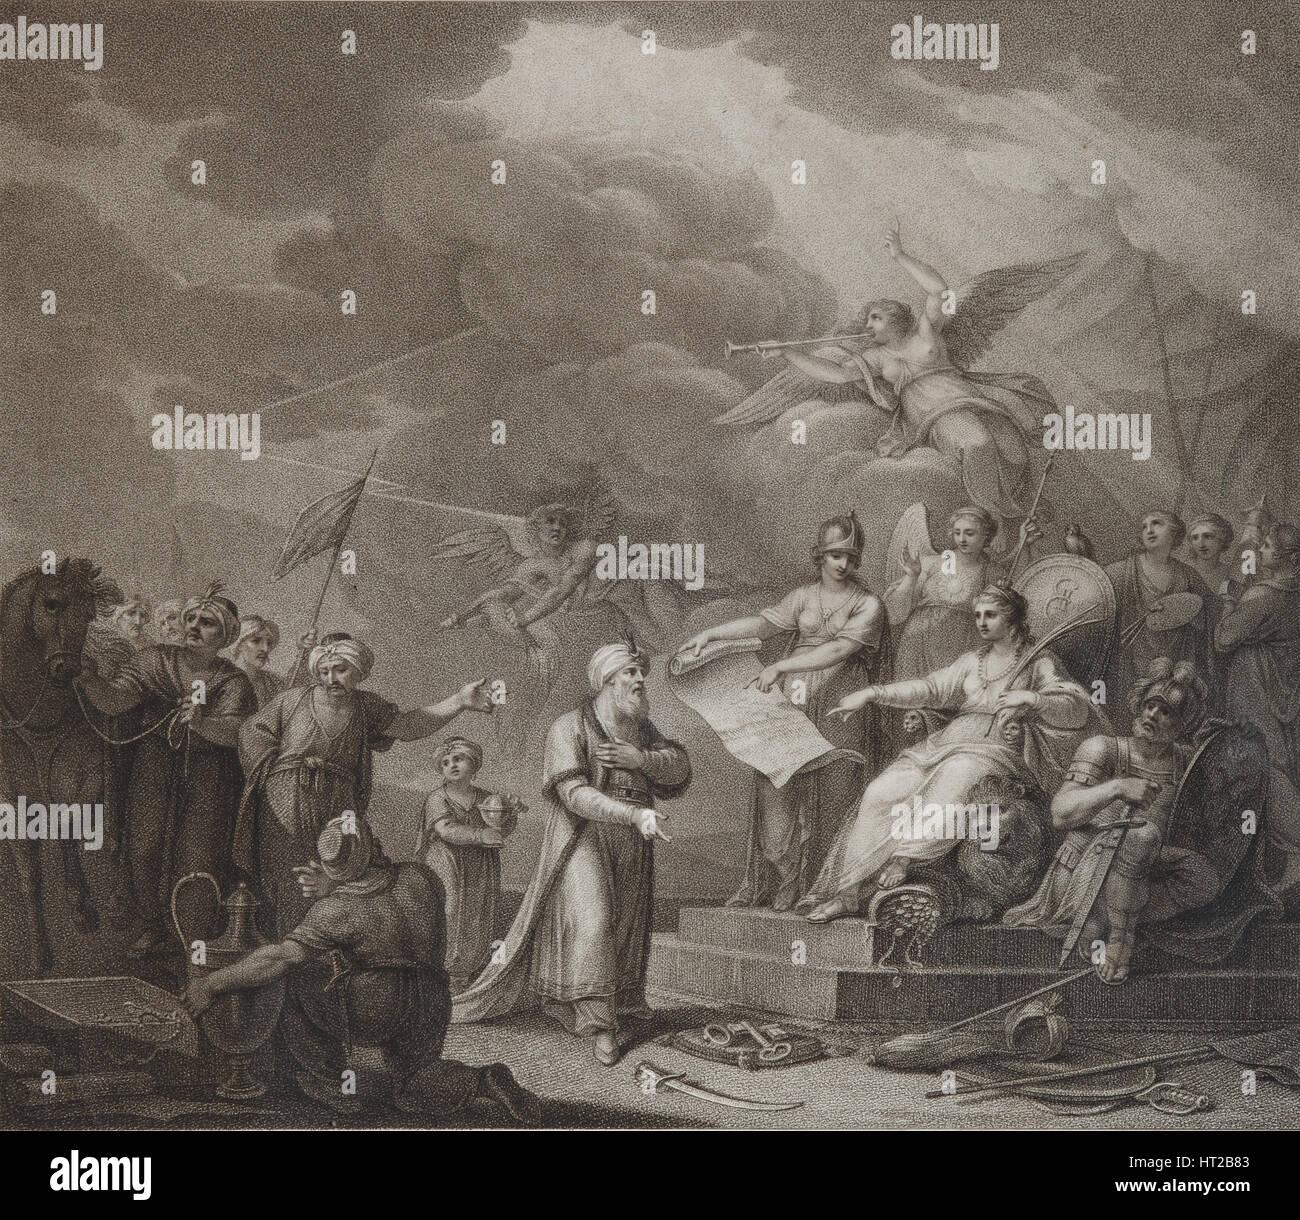 Allegory of the Treaty of Jassy, 1792. Artist: Stephanoff (Fileter Stefanof), Stepan (active 1770s-1810s) - Stock Image